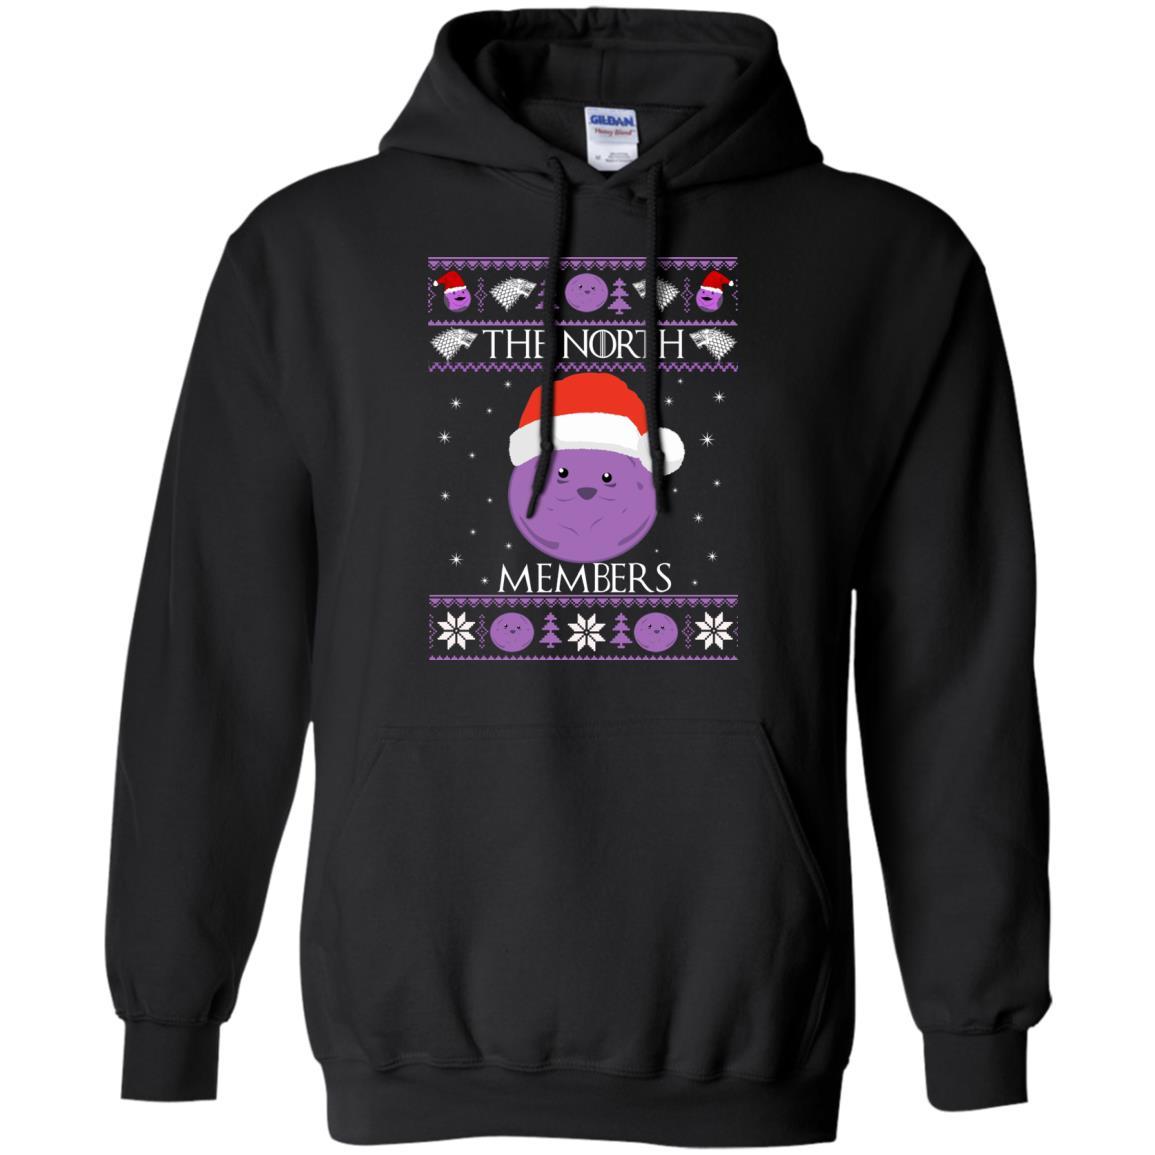 image 4782 - The North Members Christmas Sweater, Hoodie